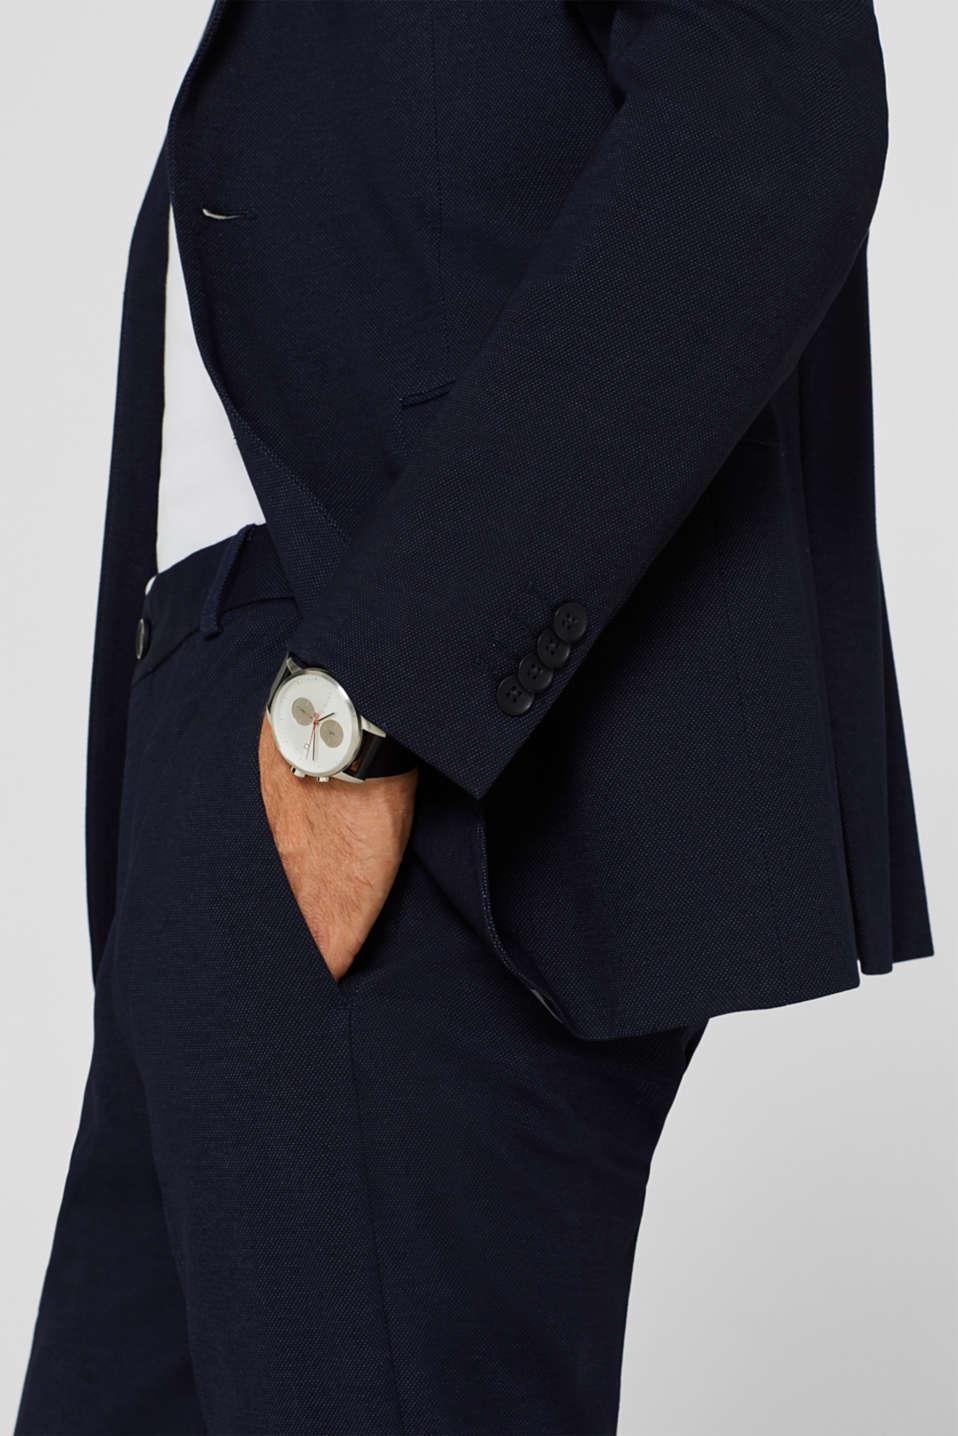 COMFORT SUIT mix + match: Textured jacket, NAVY, detail image number 2